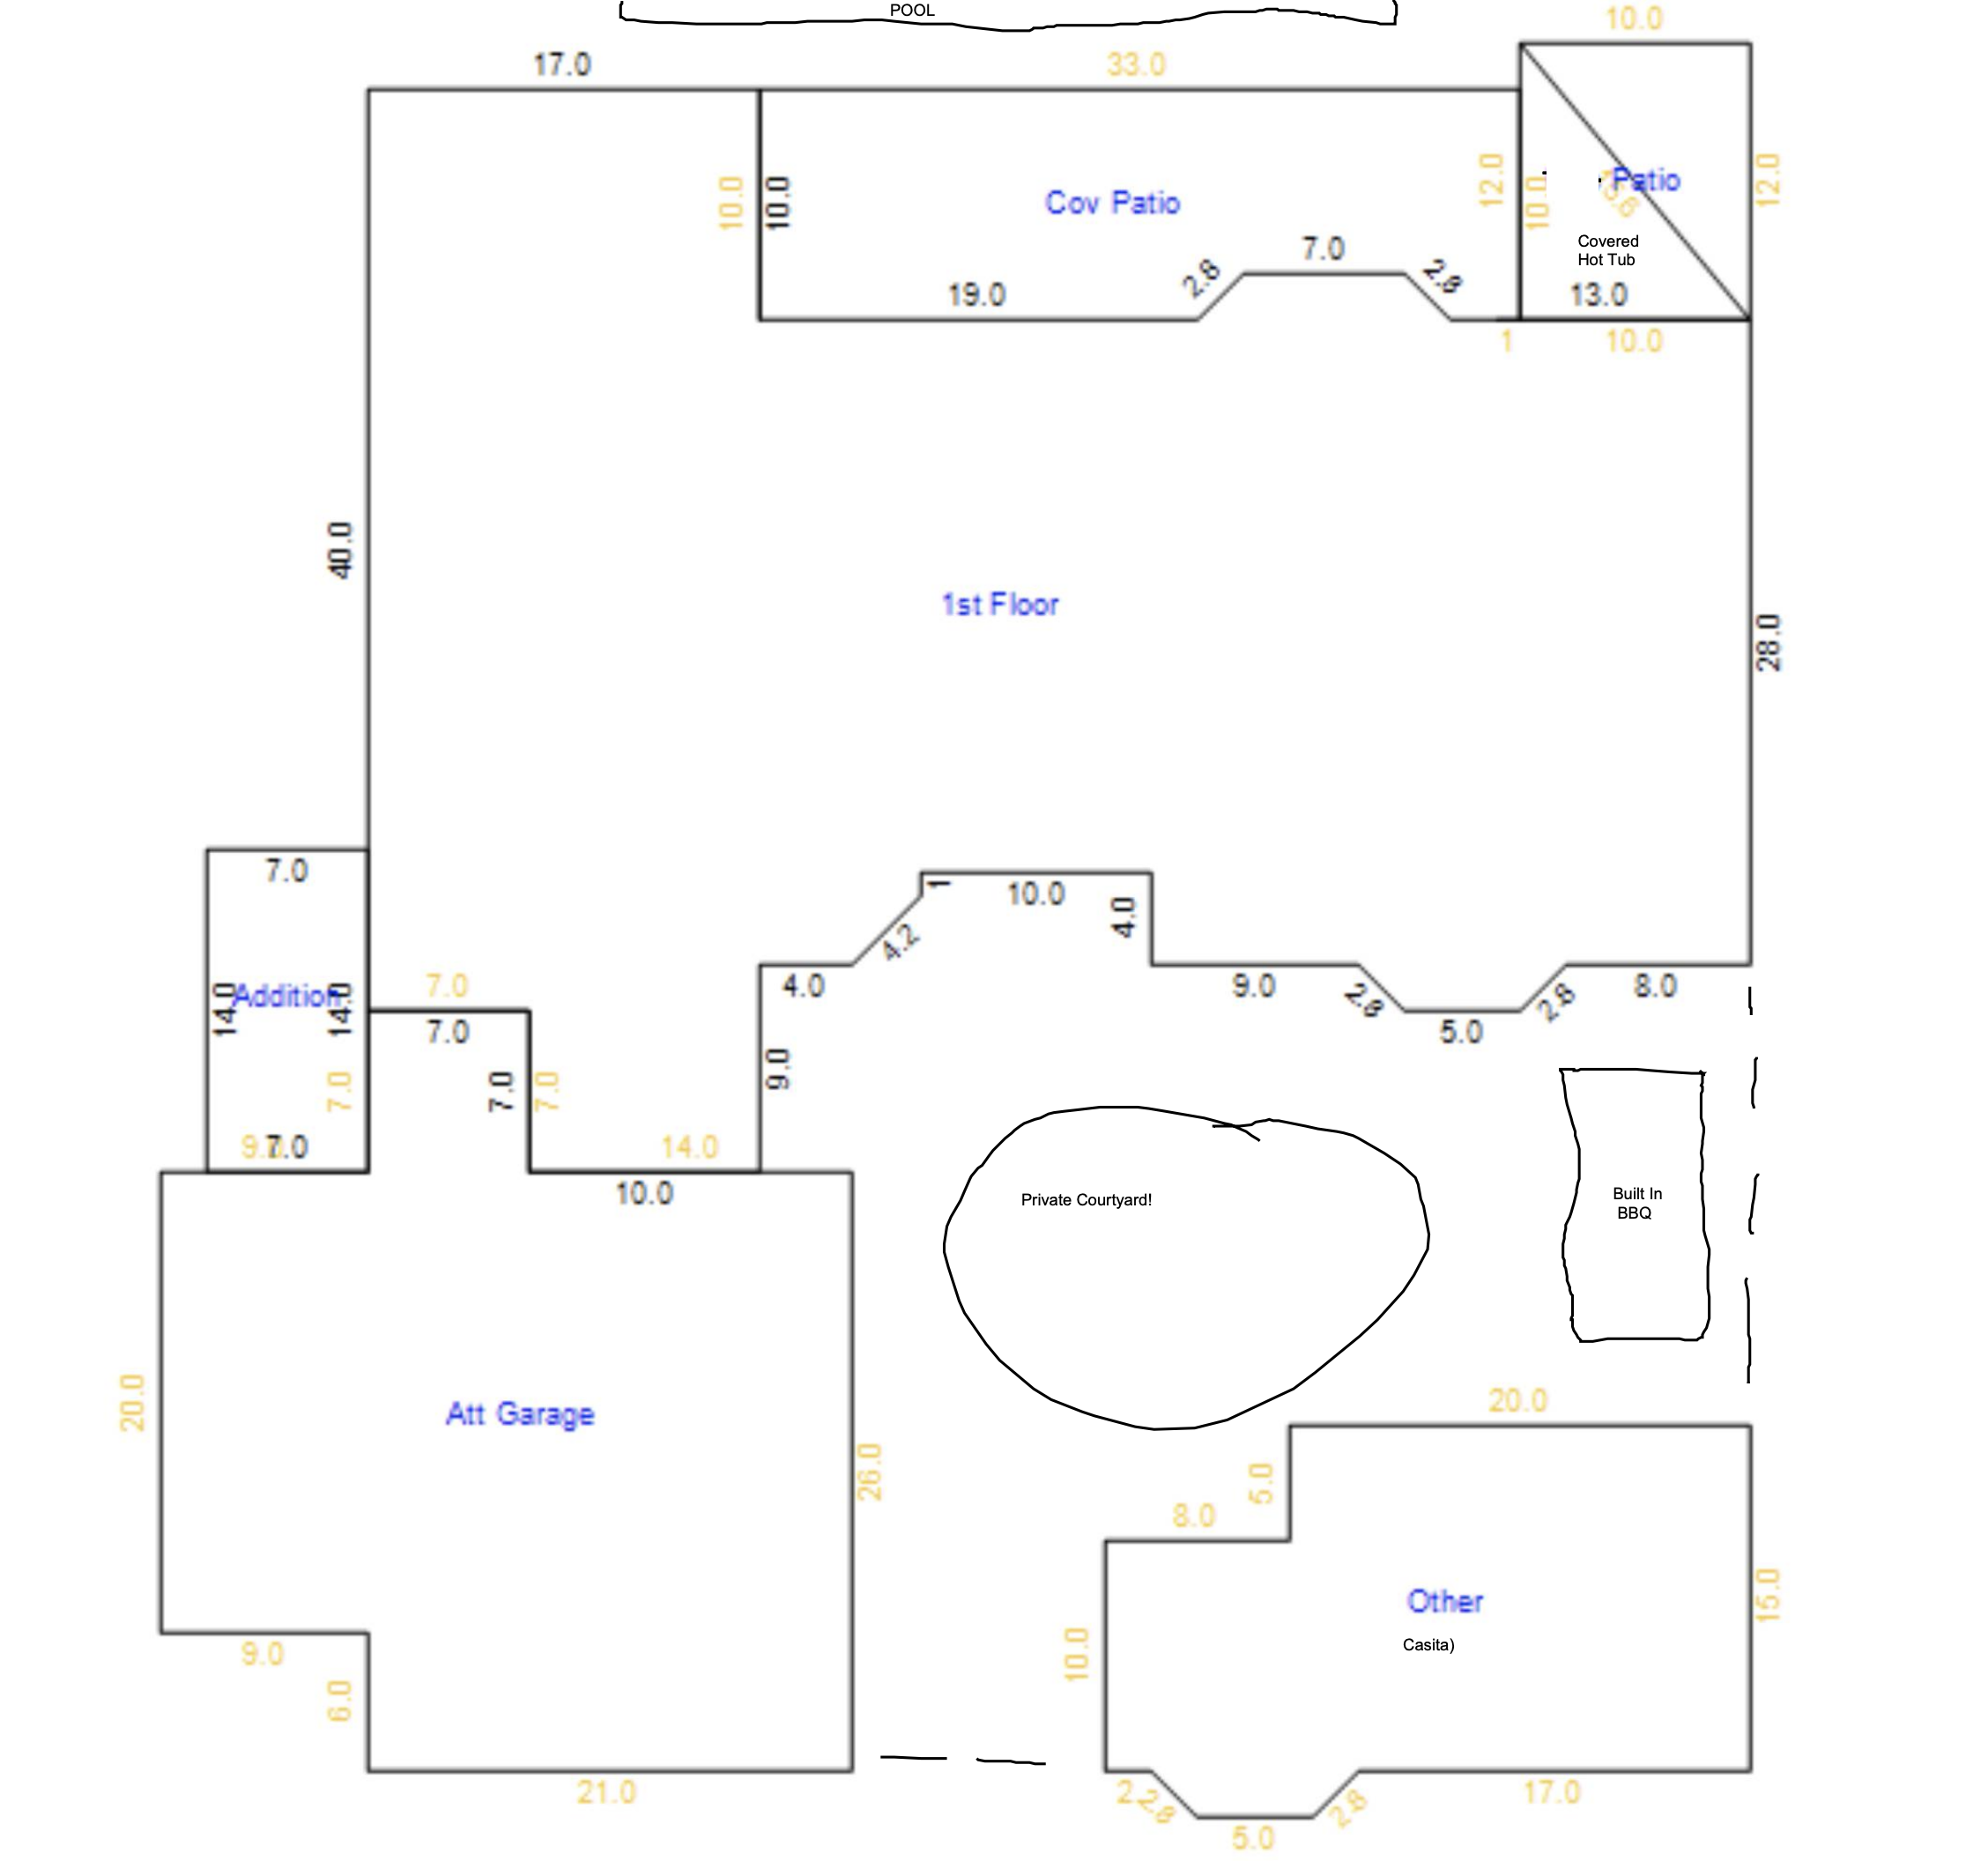 14313 W Circle Ridge Dr, Sun City West AZ 85375 Floor Plan tax records